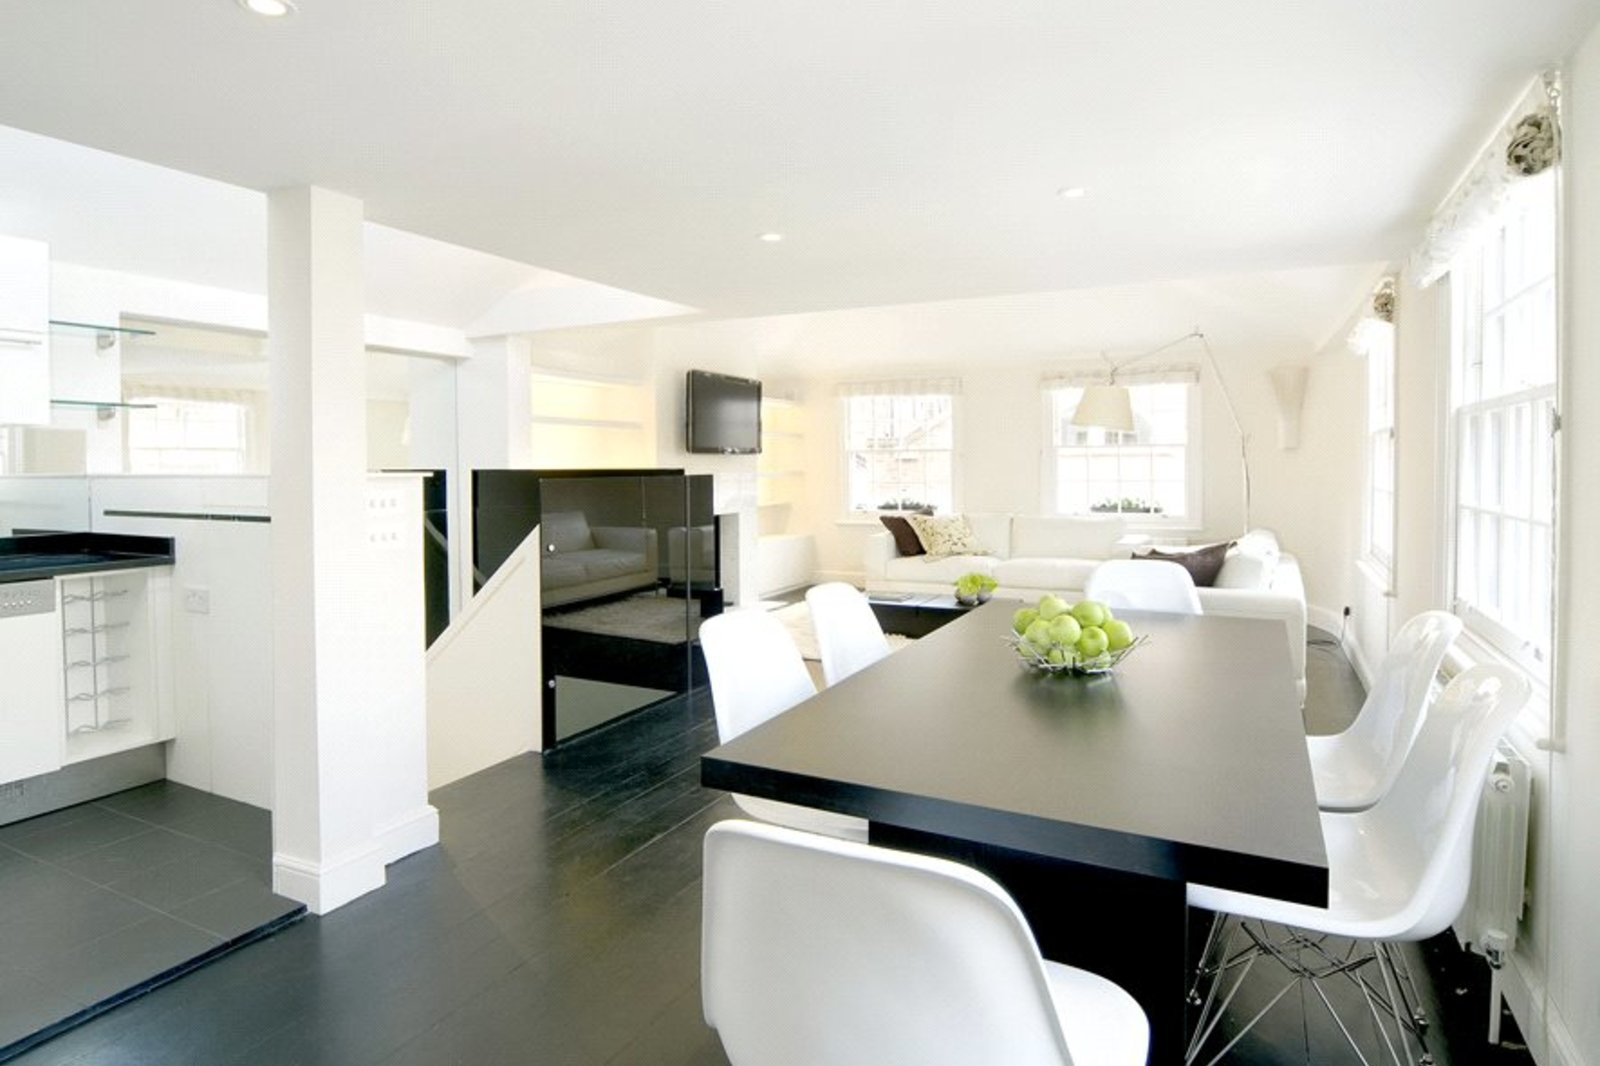 Rent A Room In Ledbury